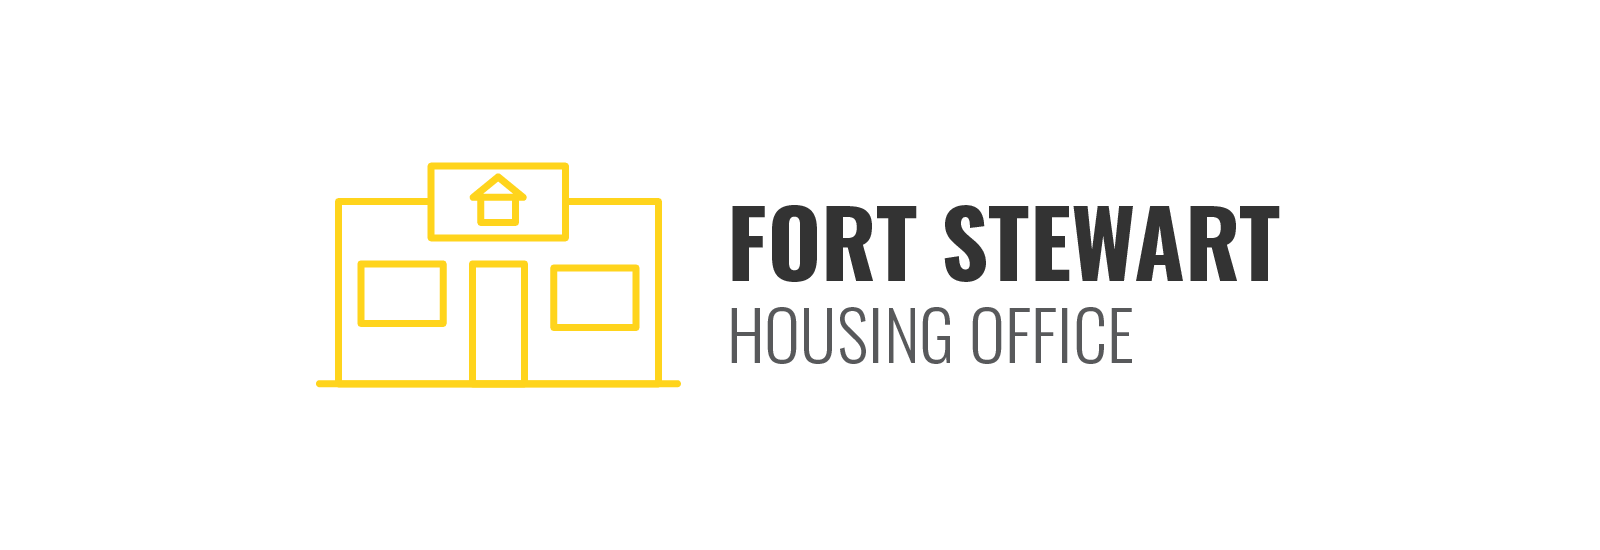 Fort Stewart Housing Office